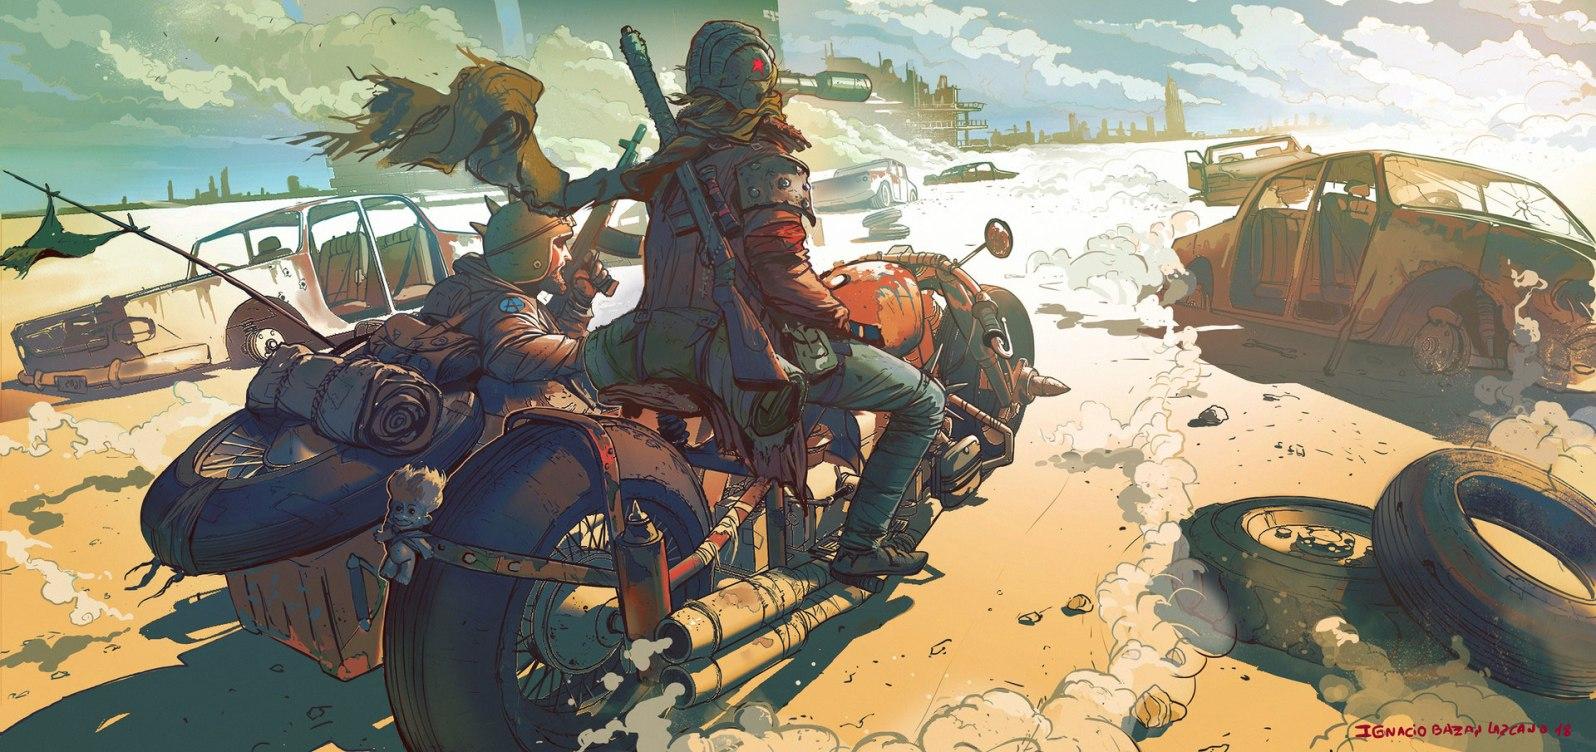 Quelle: neisbeis.artstation.com - Ignacio Bazan-Lazcano - bike 2